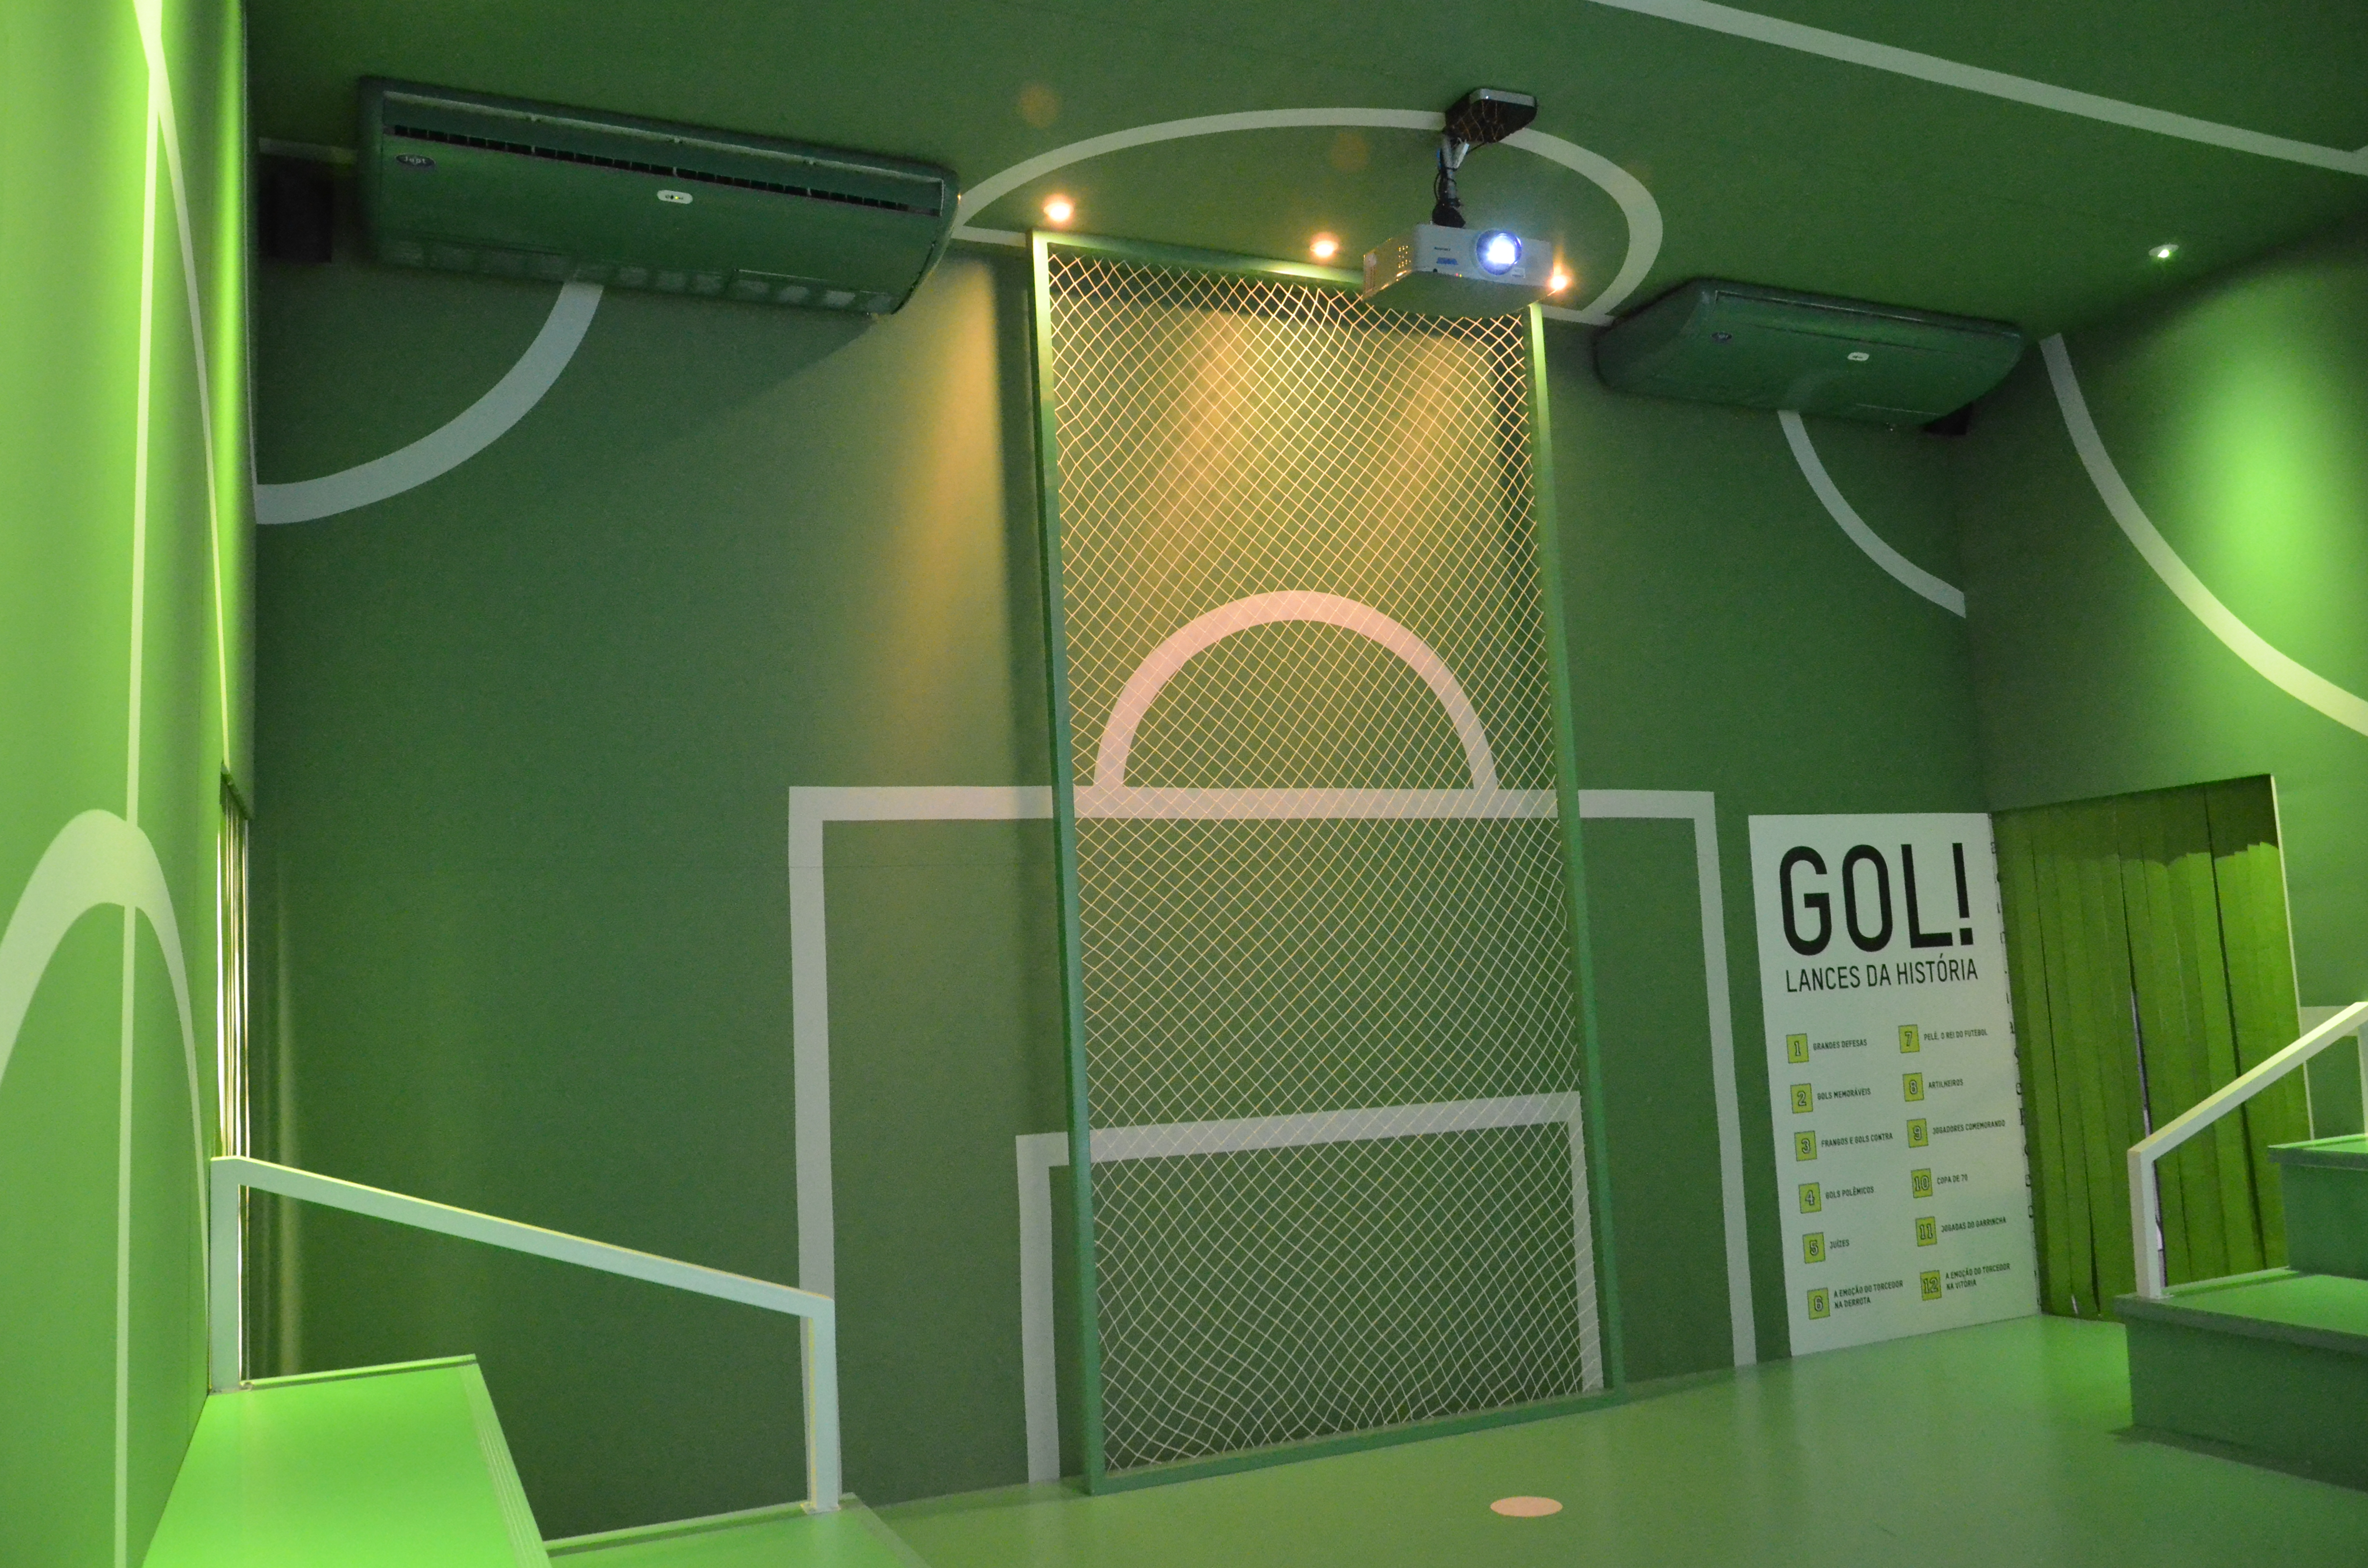 Copa do mundo -PARQUE DA BOLA